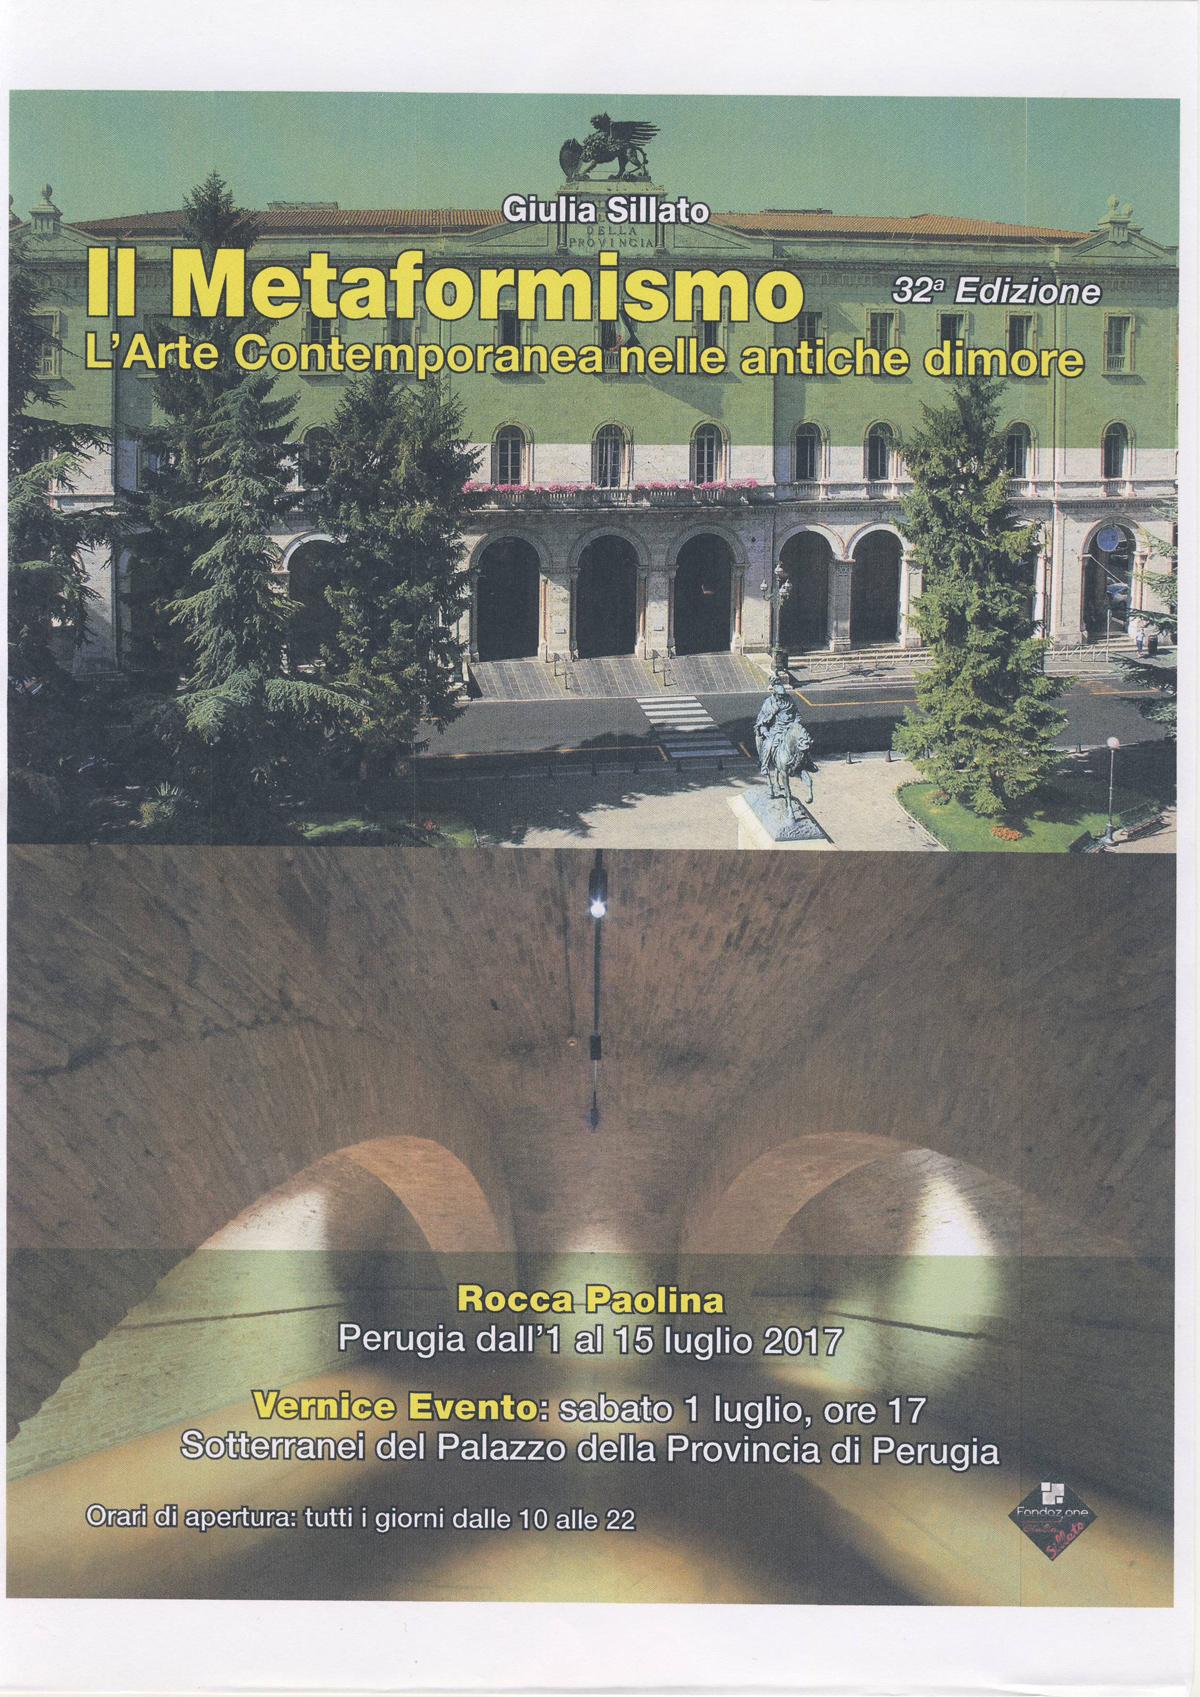 Metaformismo-L'Arte nelle antiche dimore- Perugia-Italia (2017)